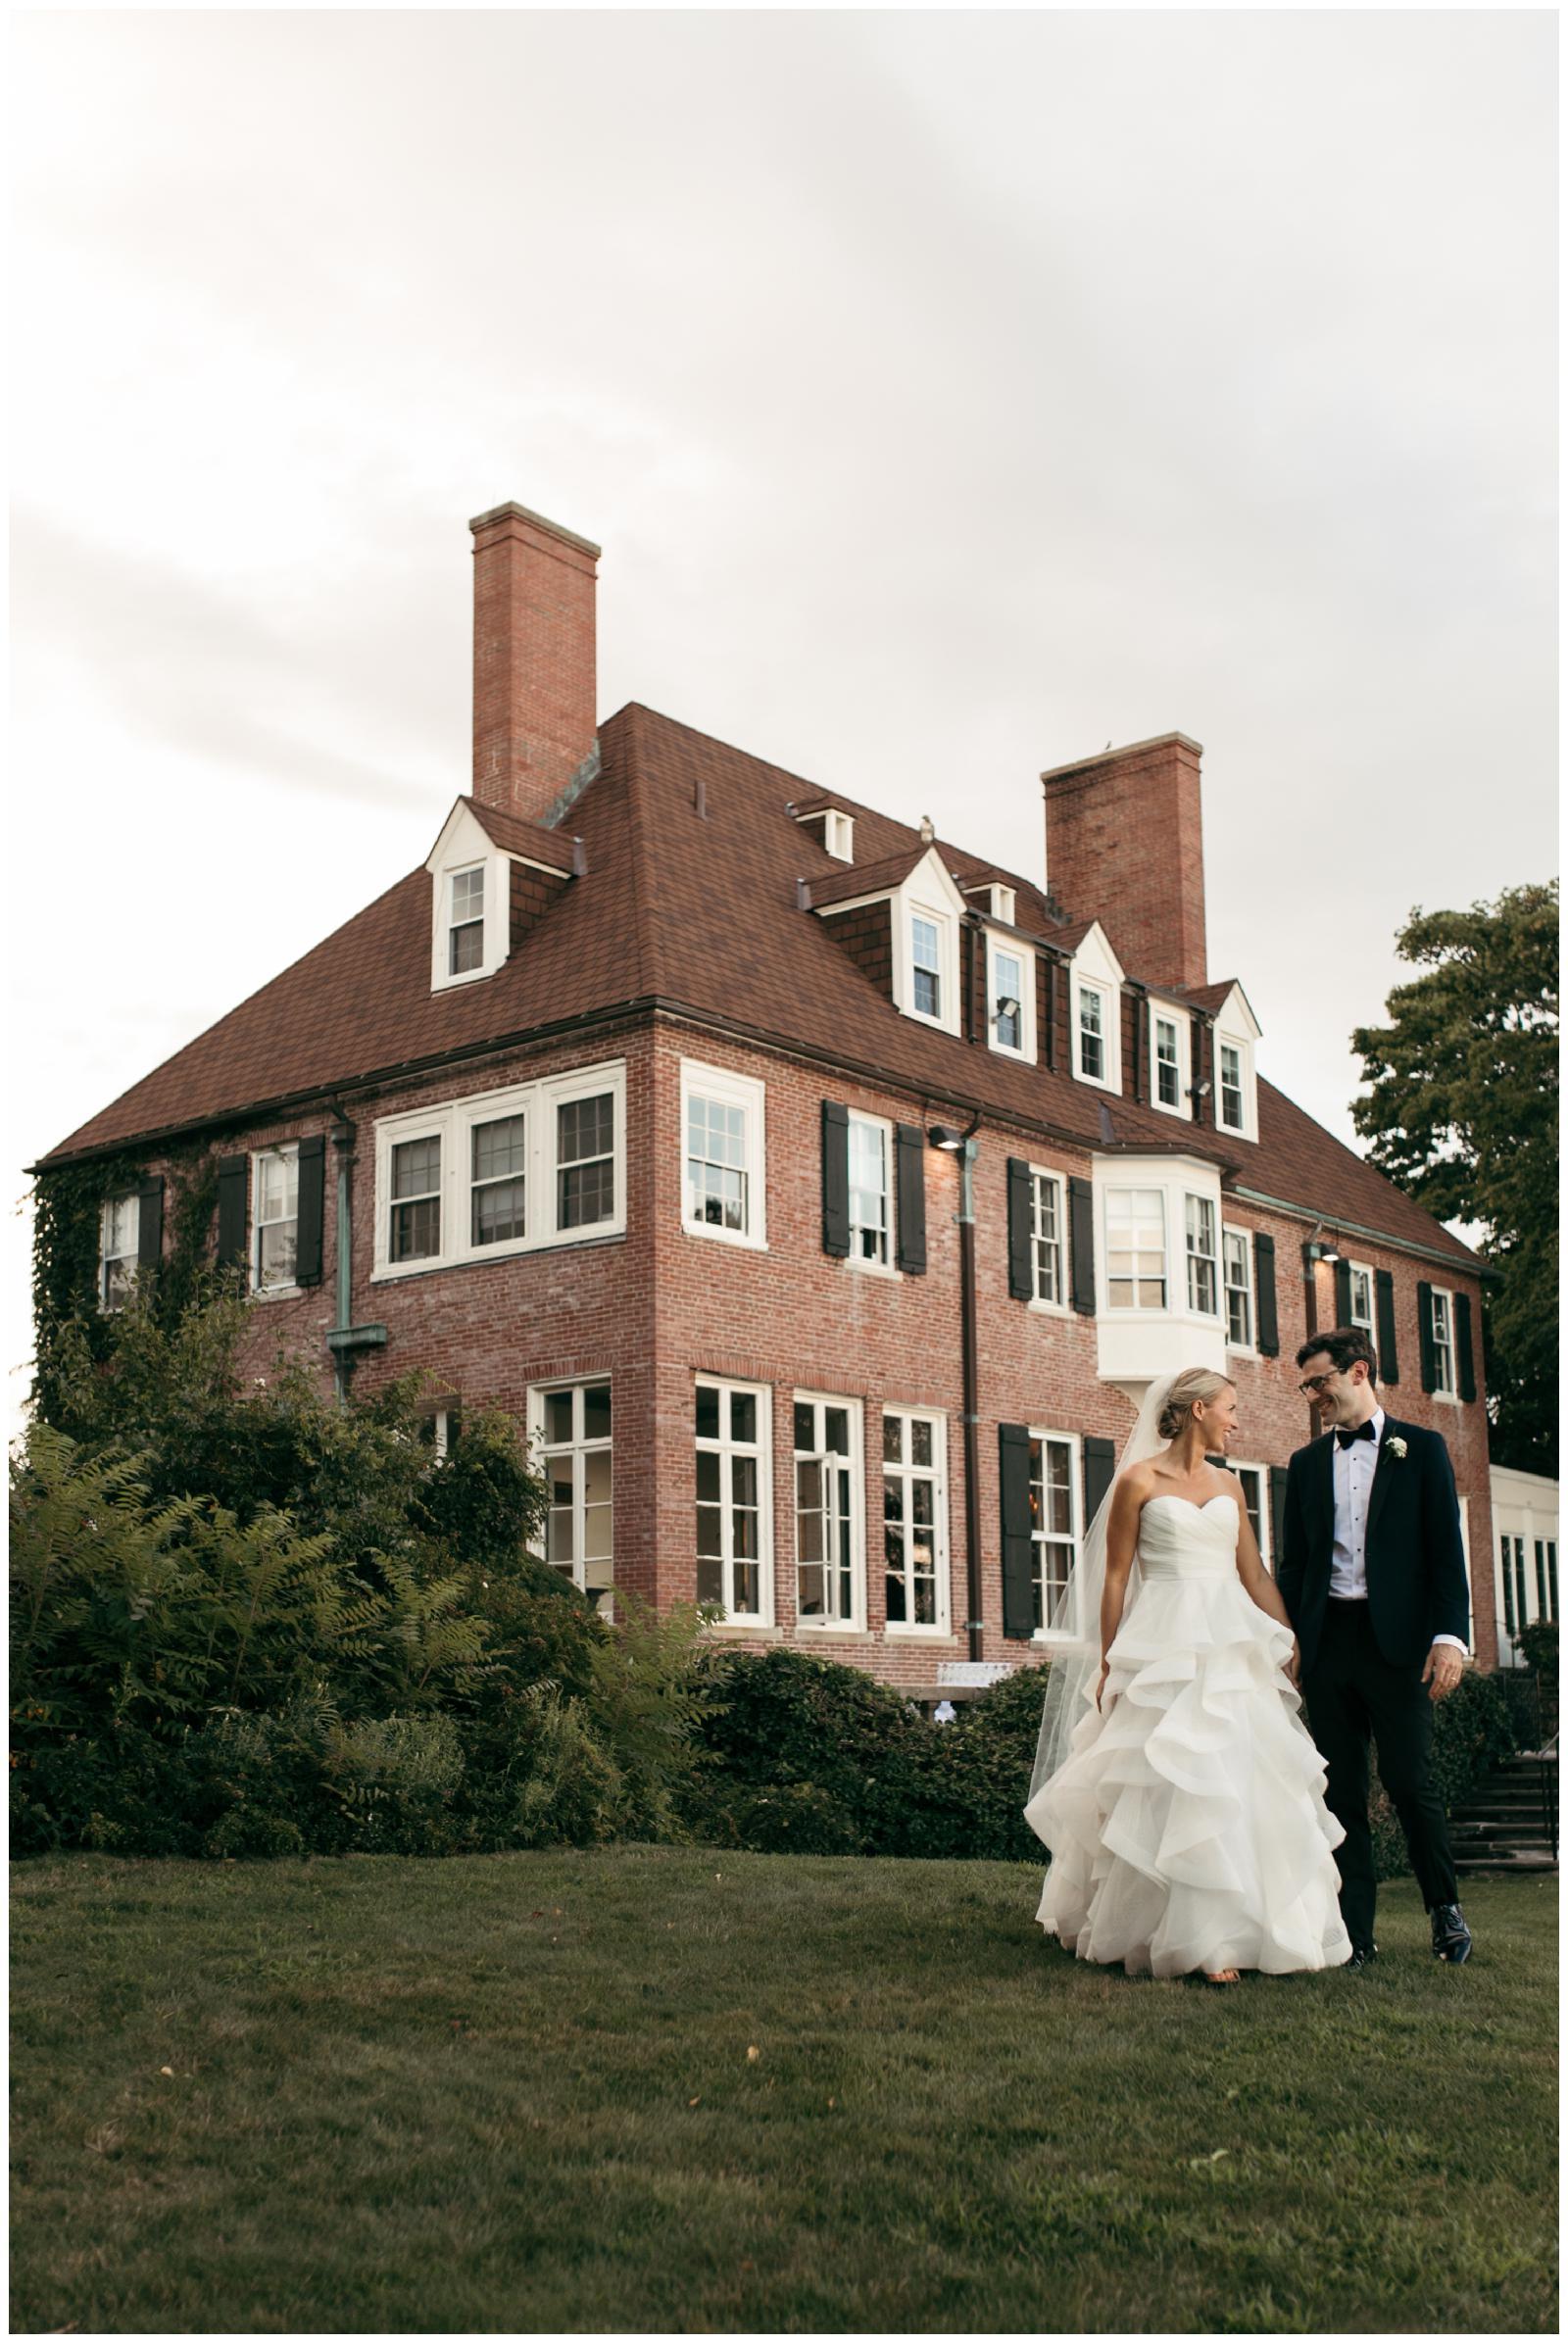 Massachusetts estate wedding venue